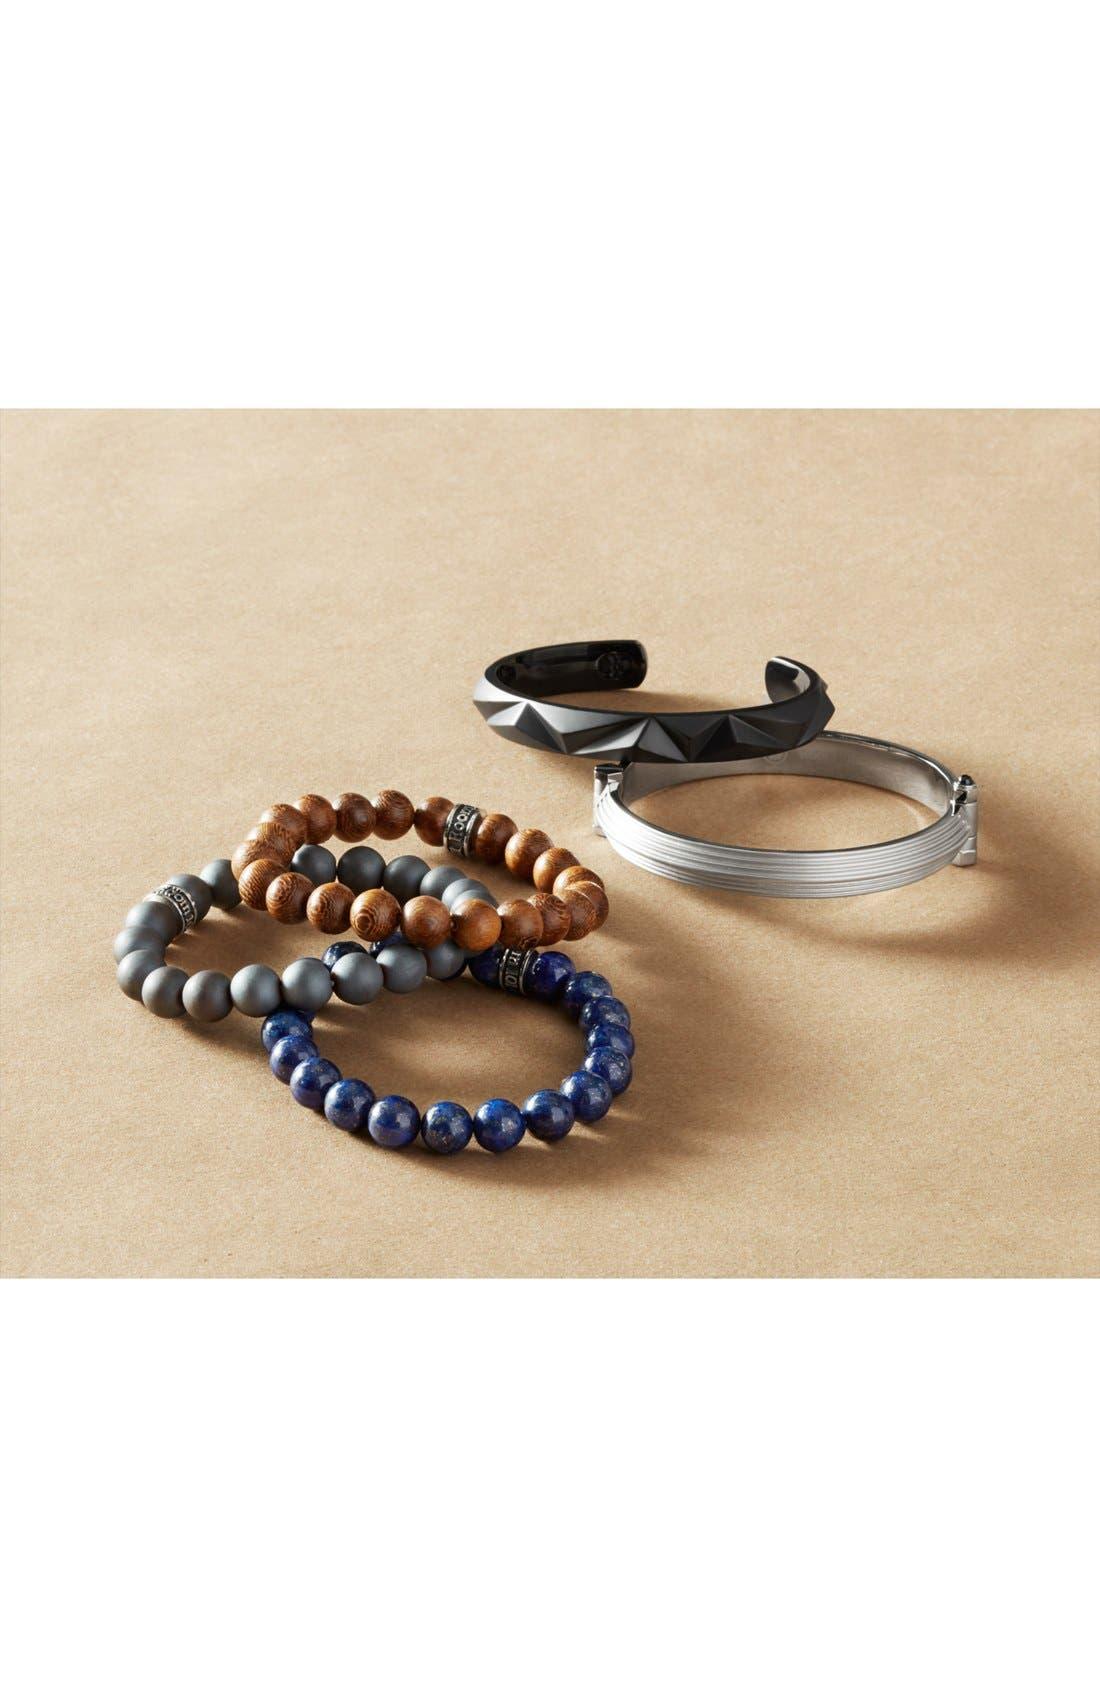 Lapis Lazuli Bead Bracelet,                             Alternate thumbnail 2, color,                             401